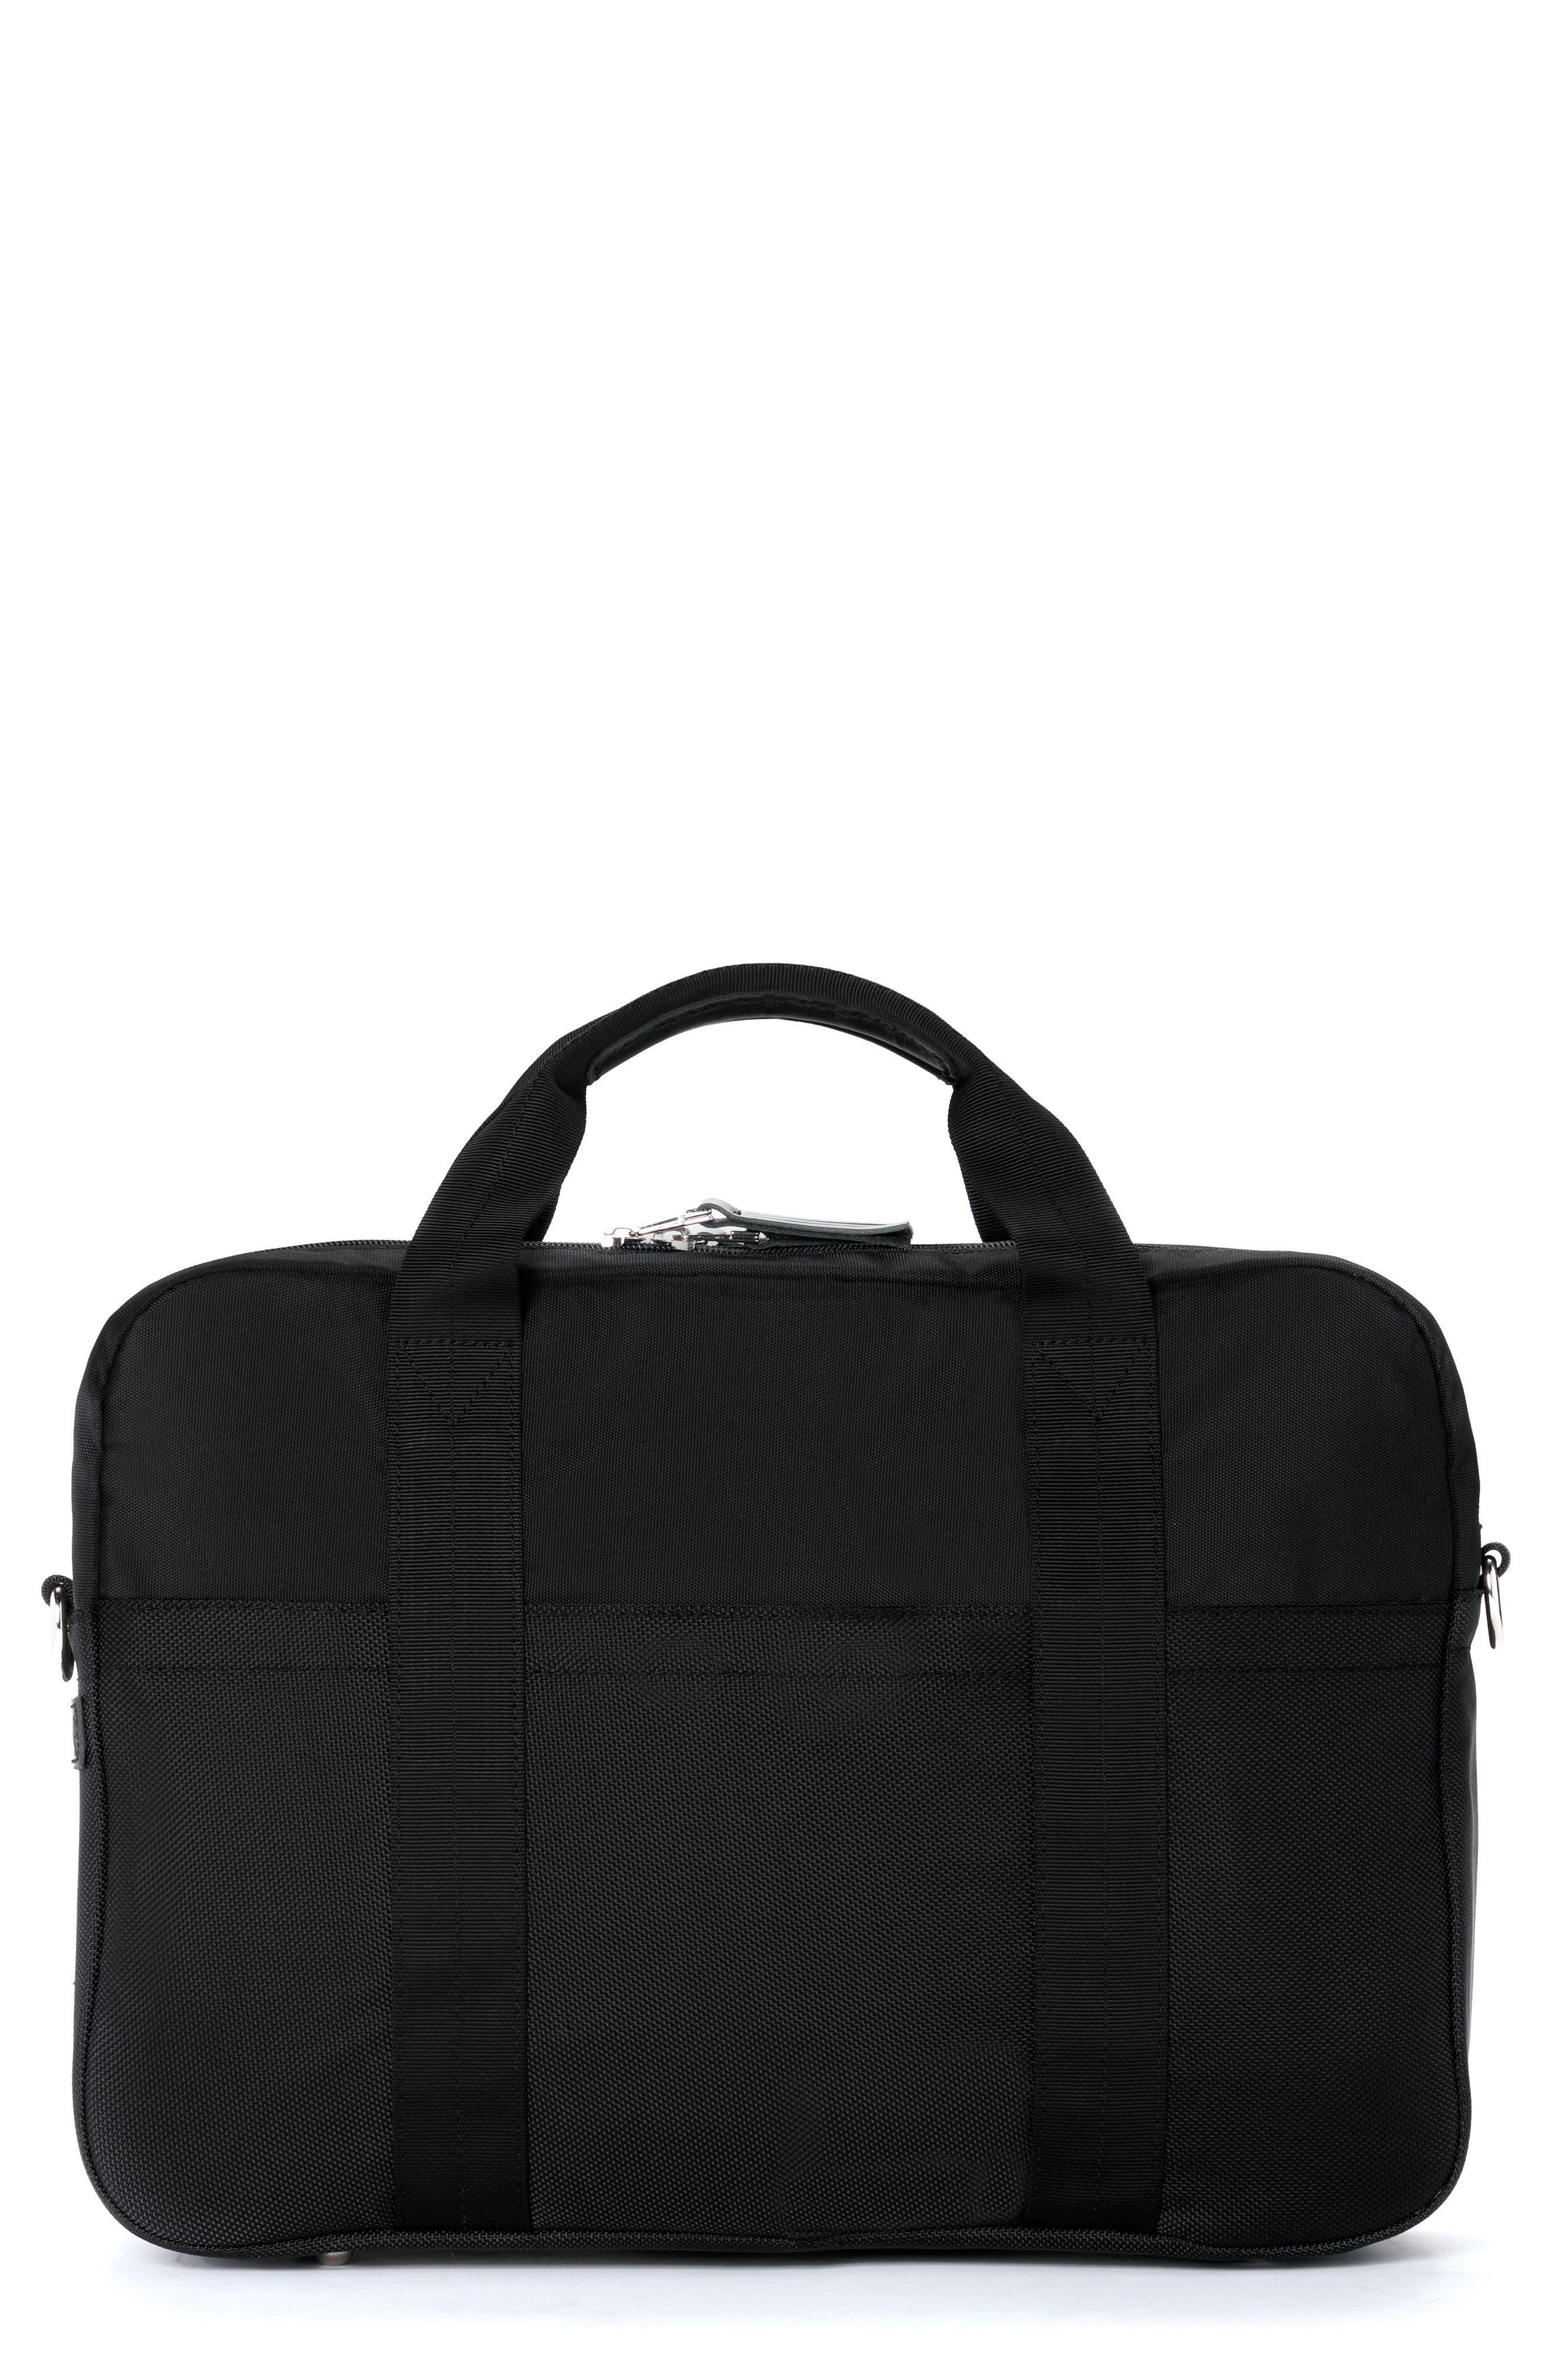 Apache Briefcase,                             Main thumbnail 1, color,                             Black